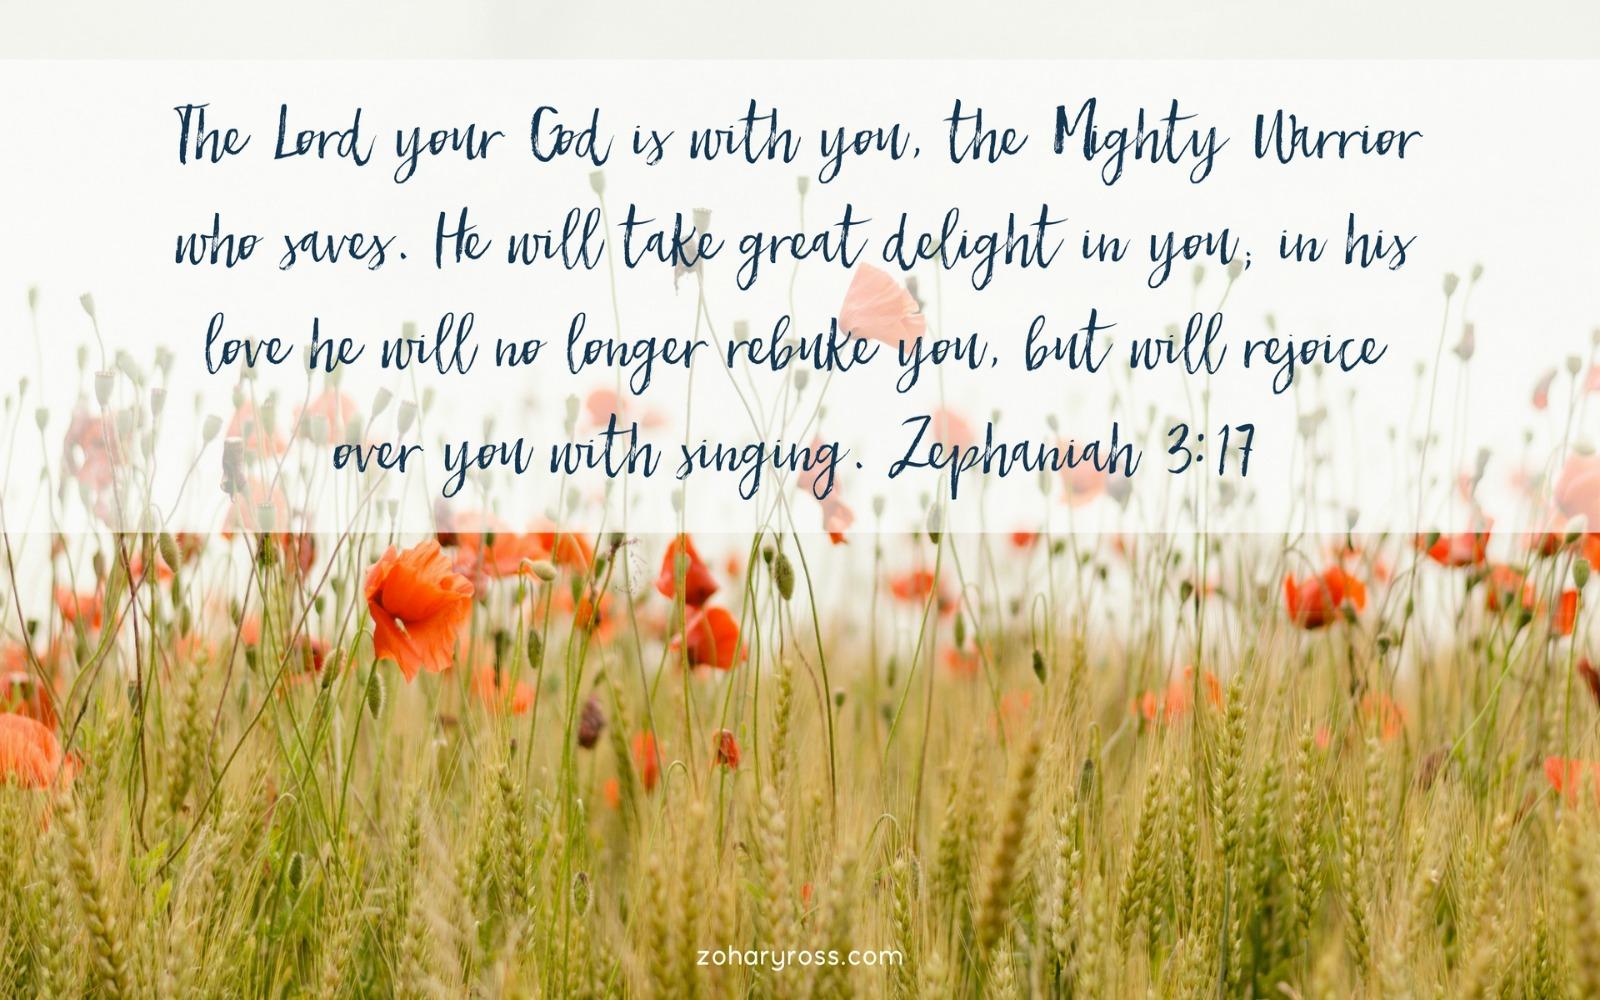 delight-blog2